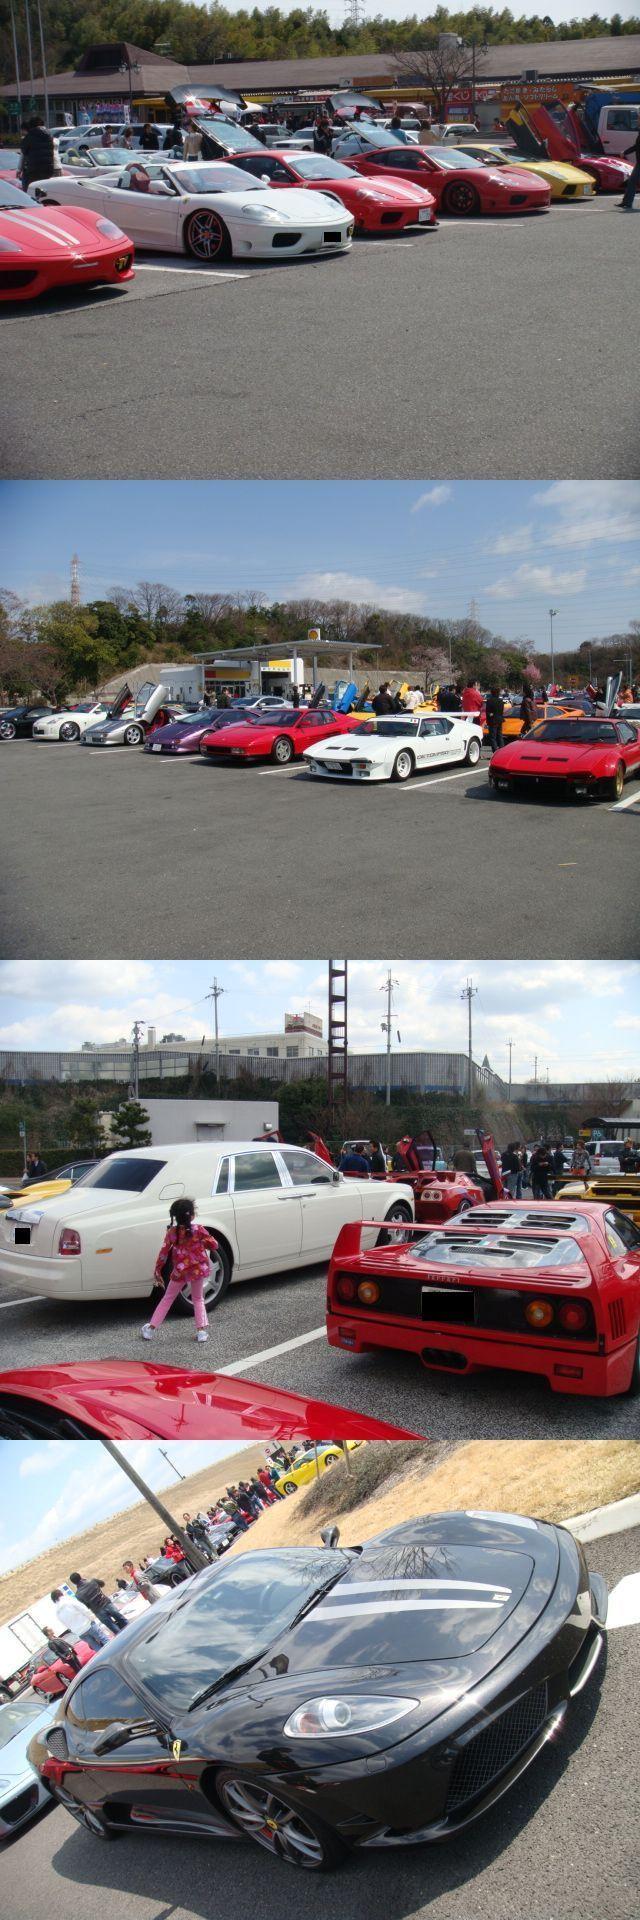 983d0eac0877 日本一の車屋!スターフェイスグループ 広報ブログ